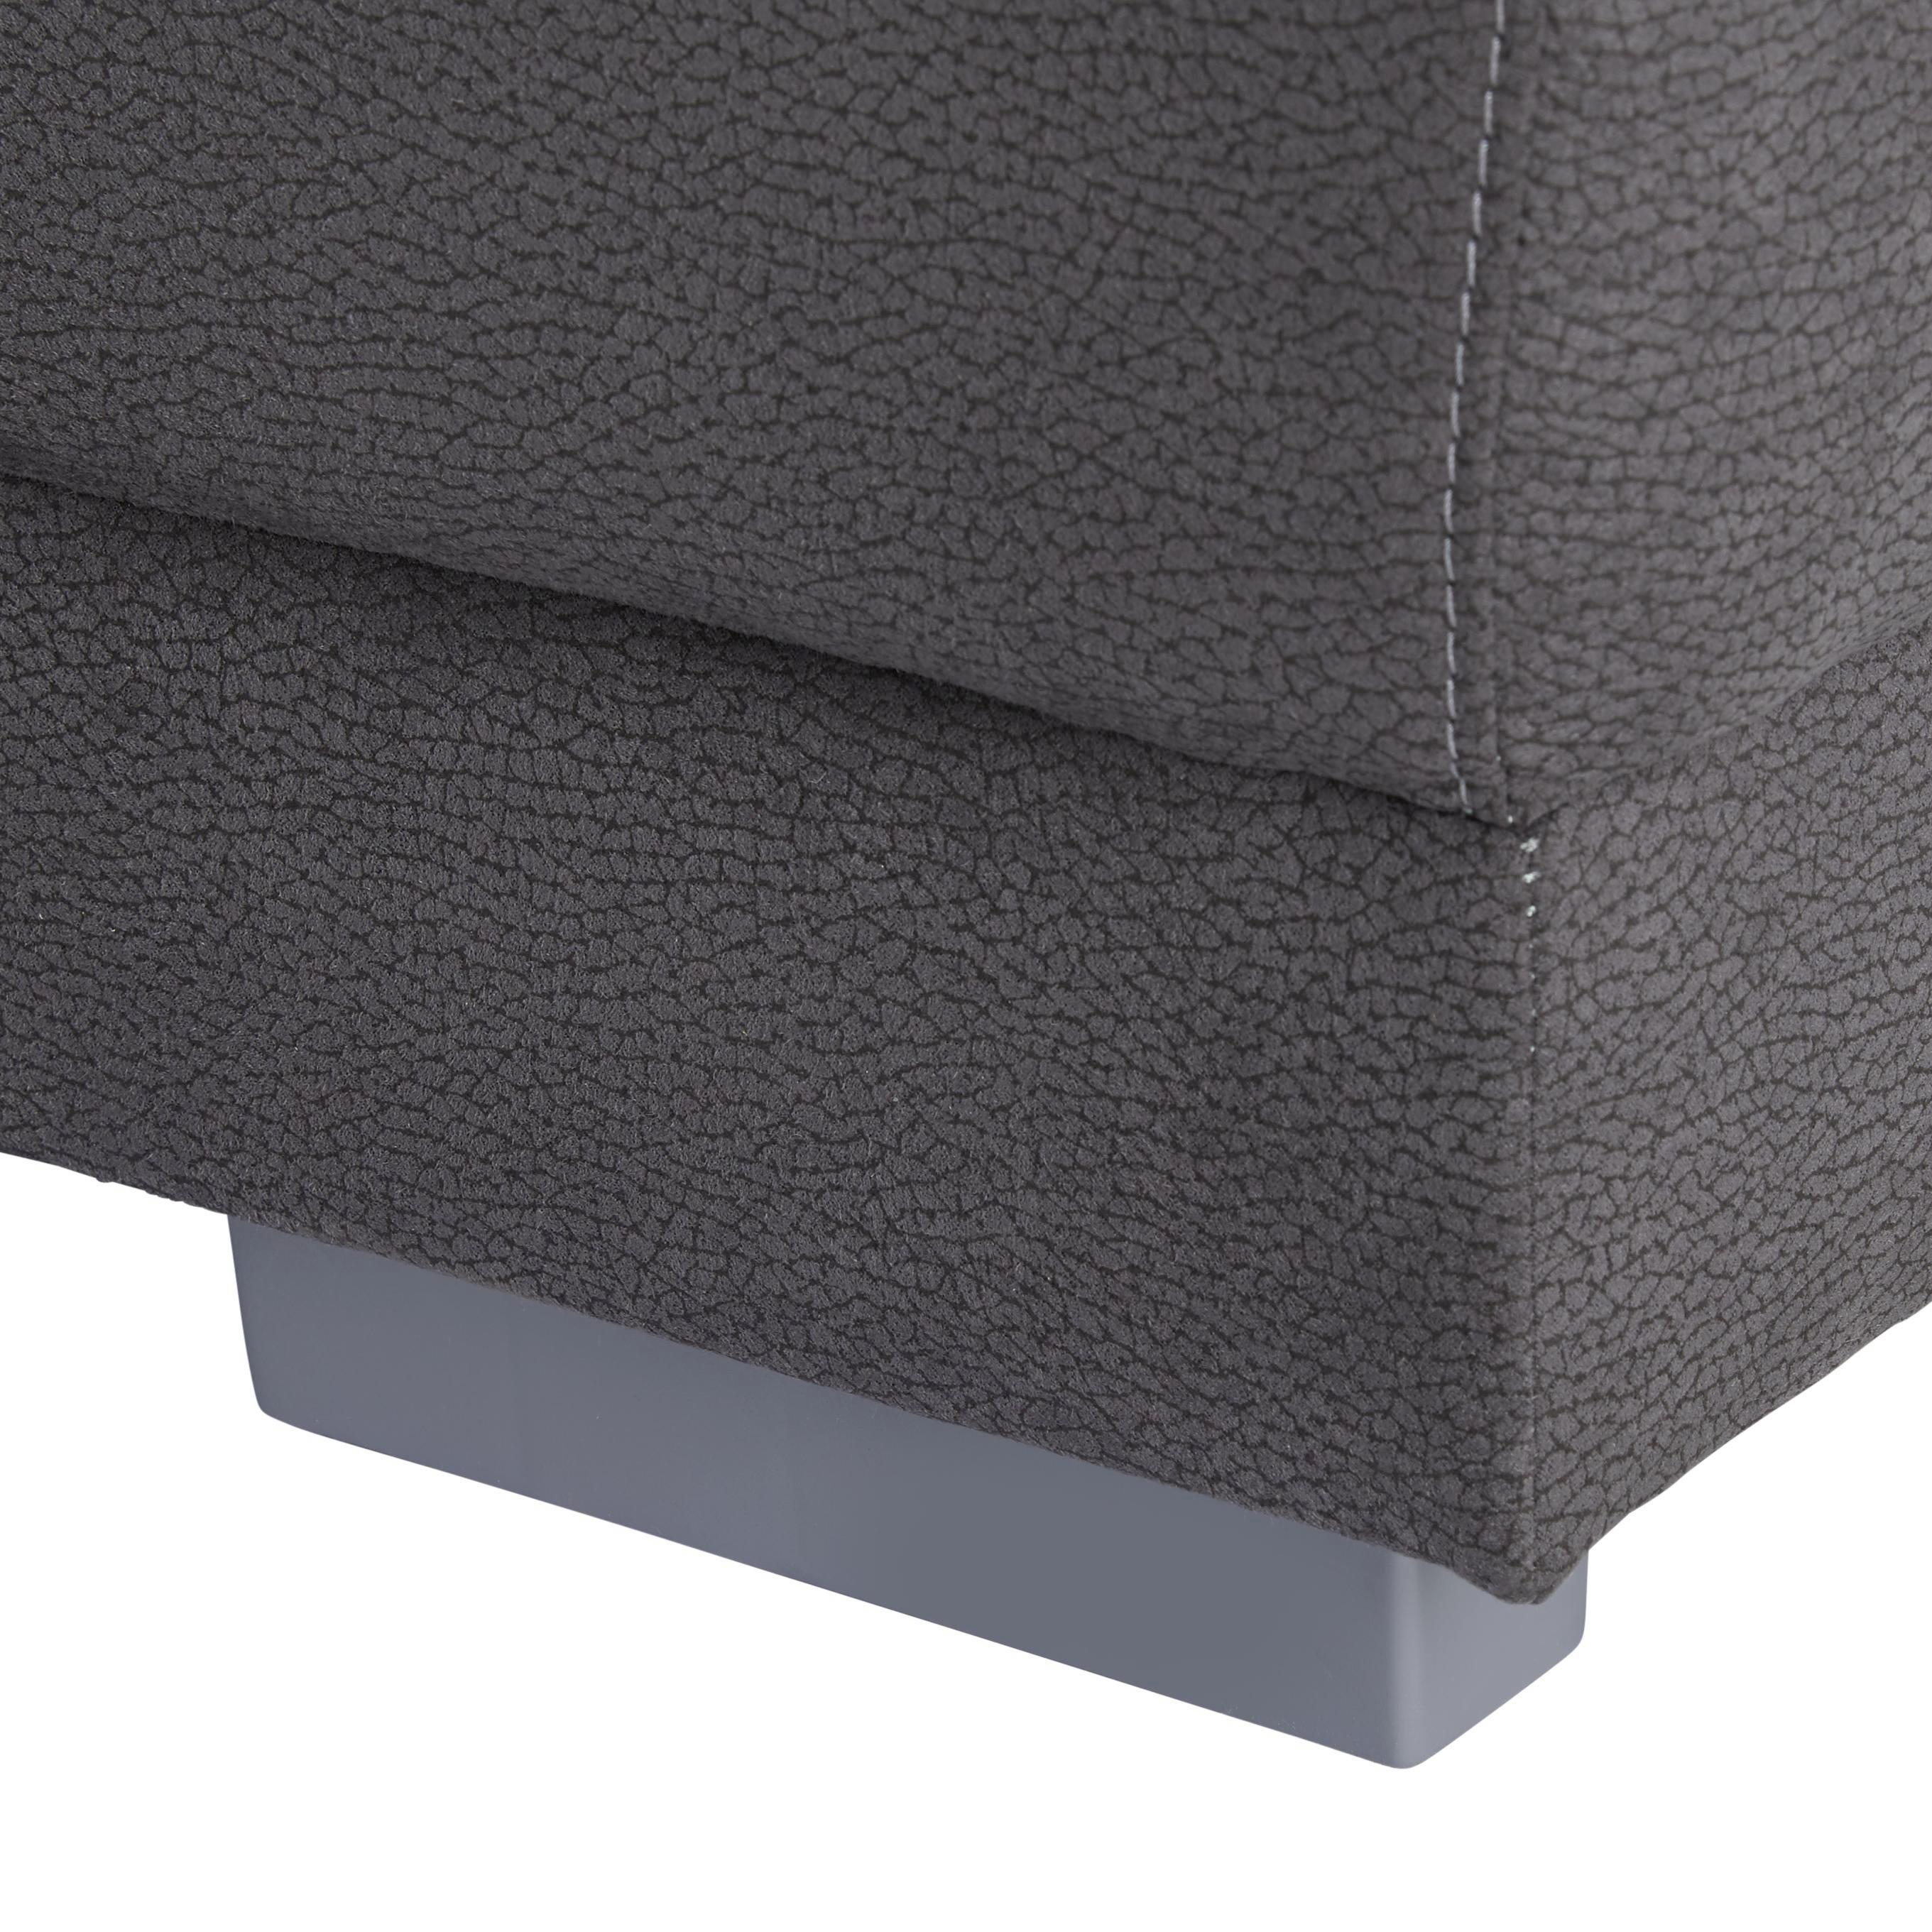 mobelde wohnwande malerei. Black Bedroom Furniture Sets. Home Design Ideas